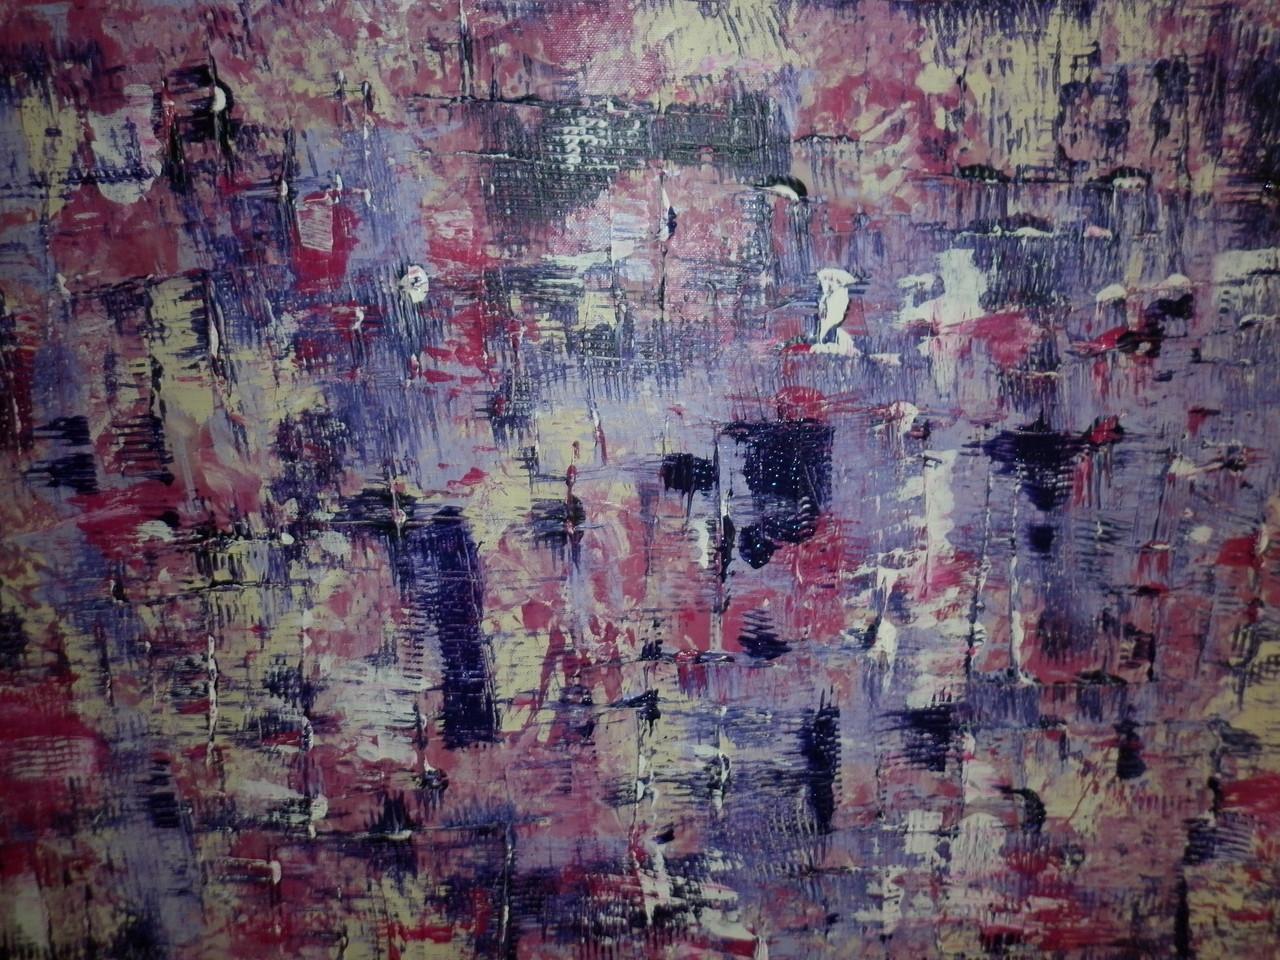 Bild-Nr. 157 o. T.  © Maß  50 x 70  m. Rahmen Acryl/Leinwand auf Keilrahmen